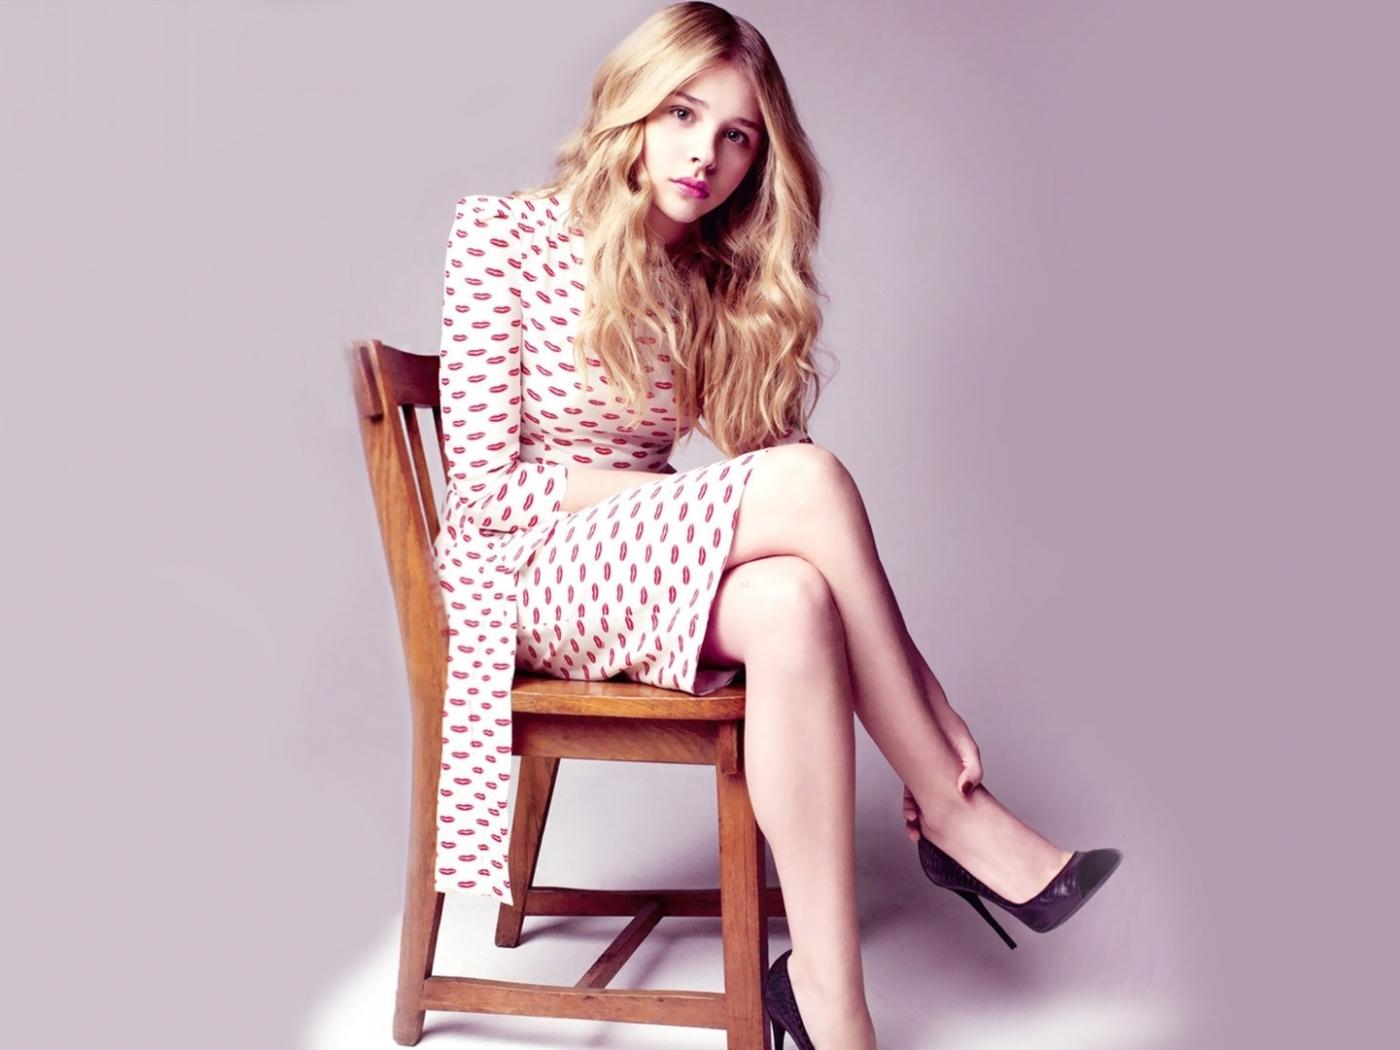 Chloe Grace Moretz, sit, celebrity, 1400x1050 wallpaper